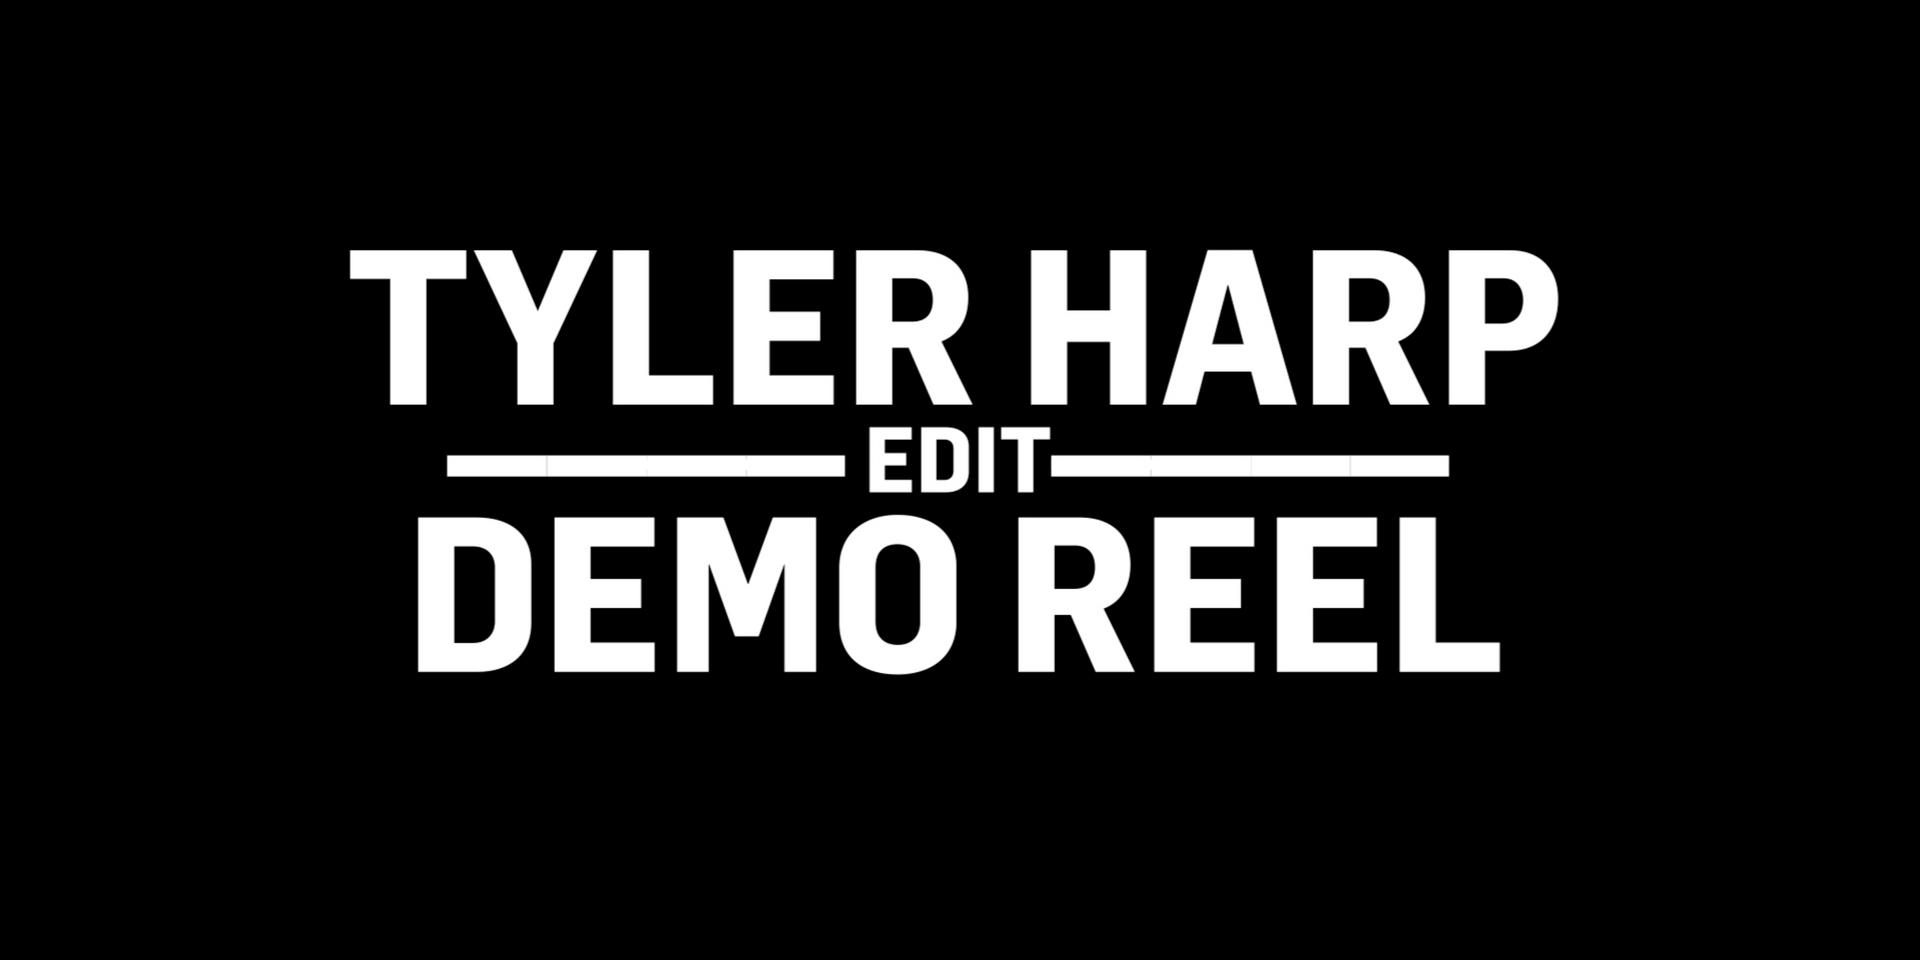 Edit Demo Reel